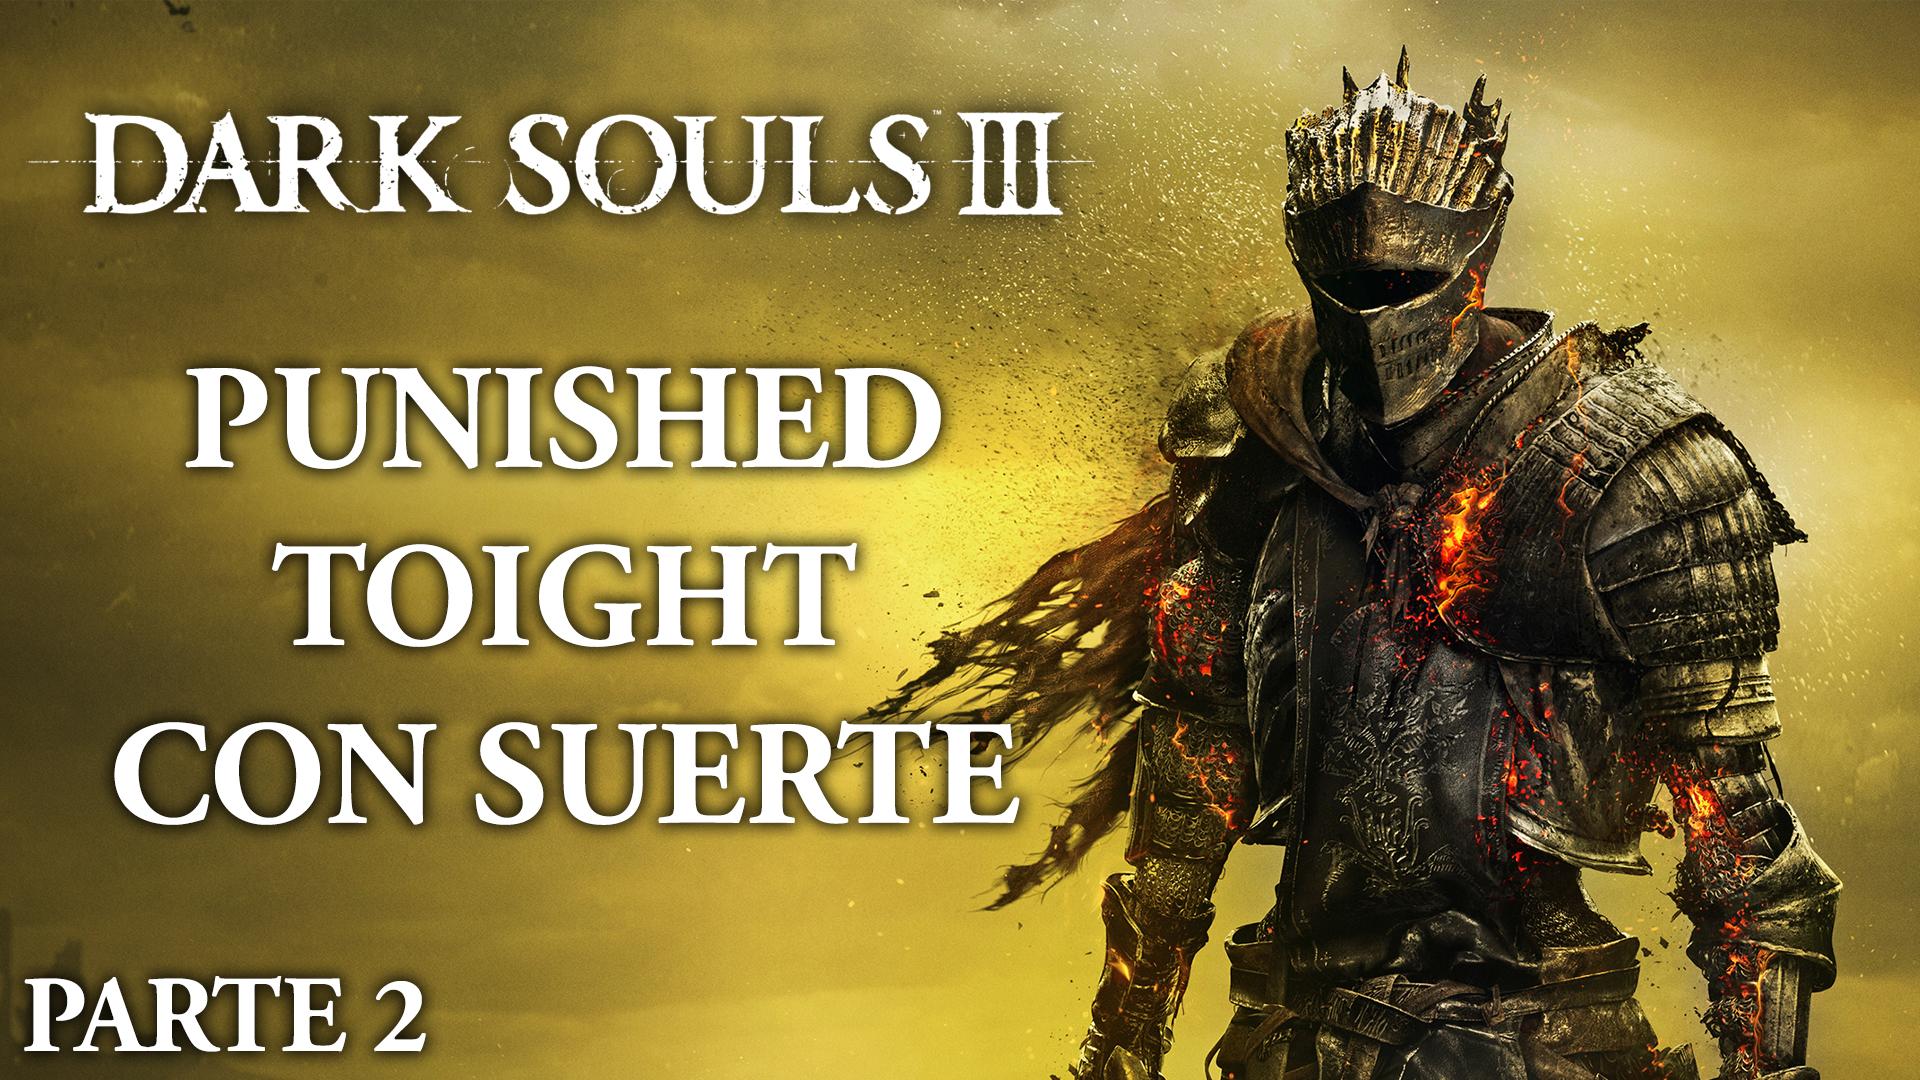 Serie Dark Souls III #02 – Punished Toight con Suerte